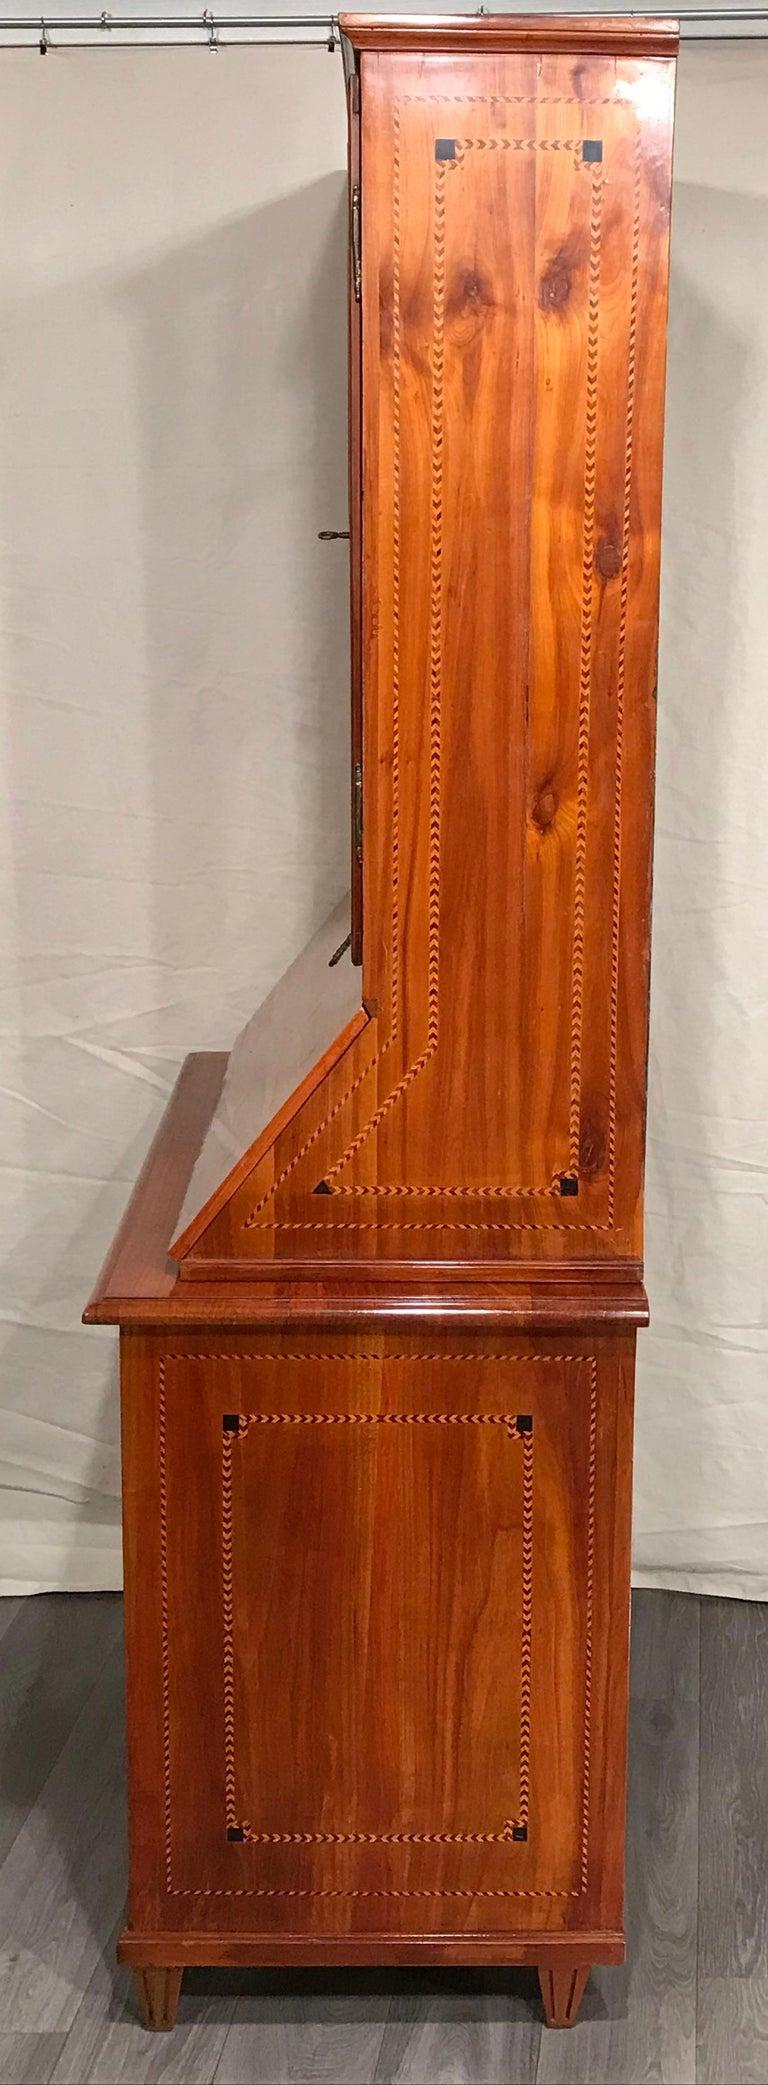 Veneer Louis XVI Secretary Bookcase, South German 1780, Cherry For Sale